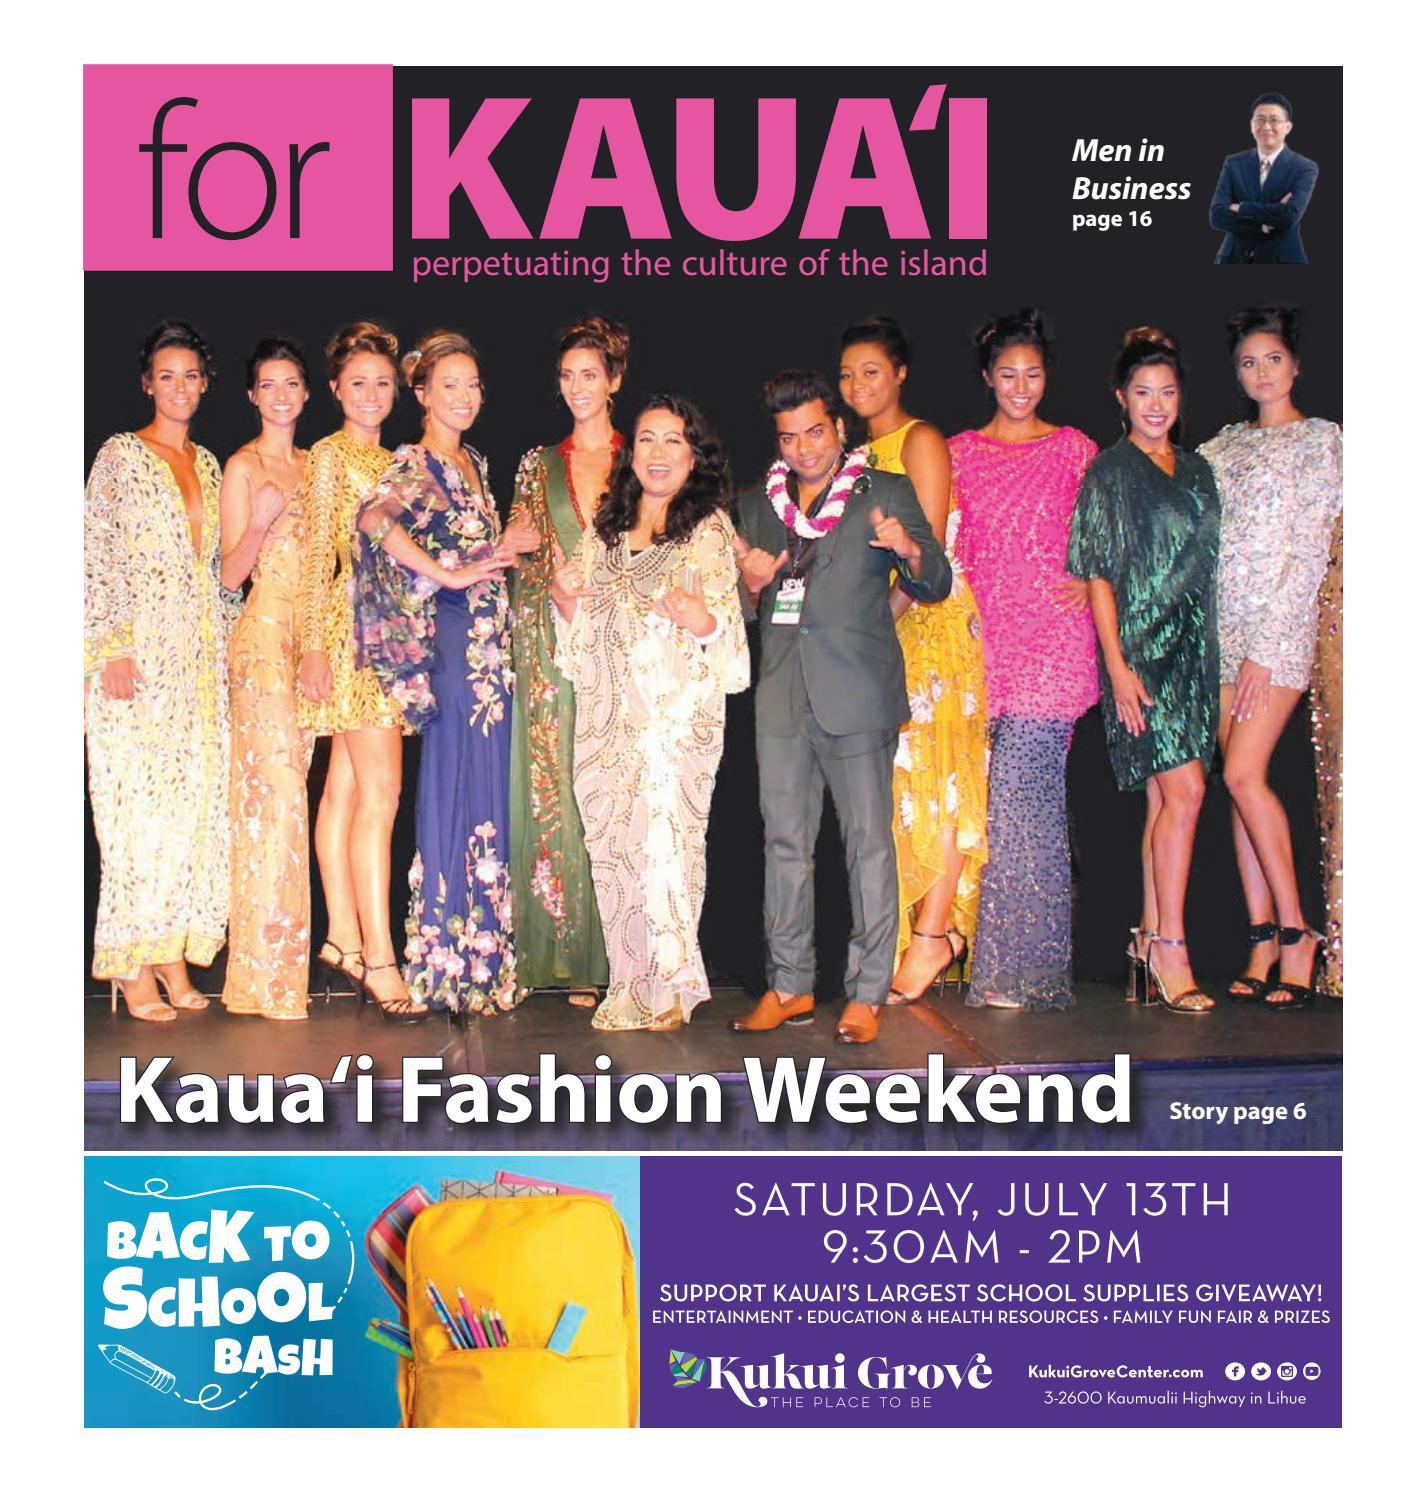 3d Rose Poipu Beach Kauai Hawaii Porcelain Plate 8 Home Décor Accents Commemorative Decorative Plates